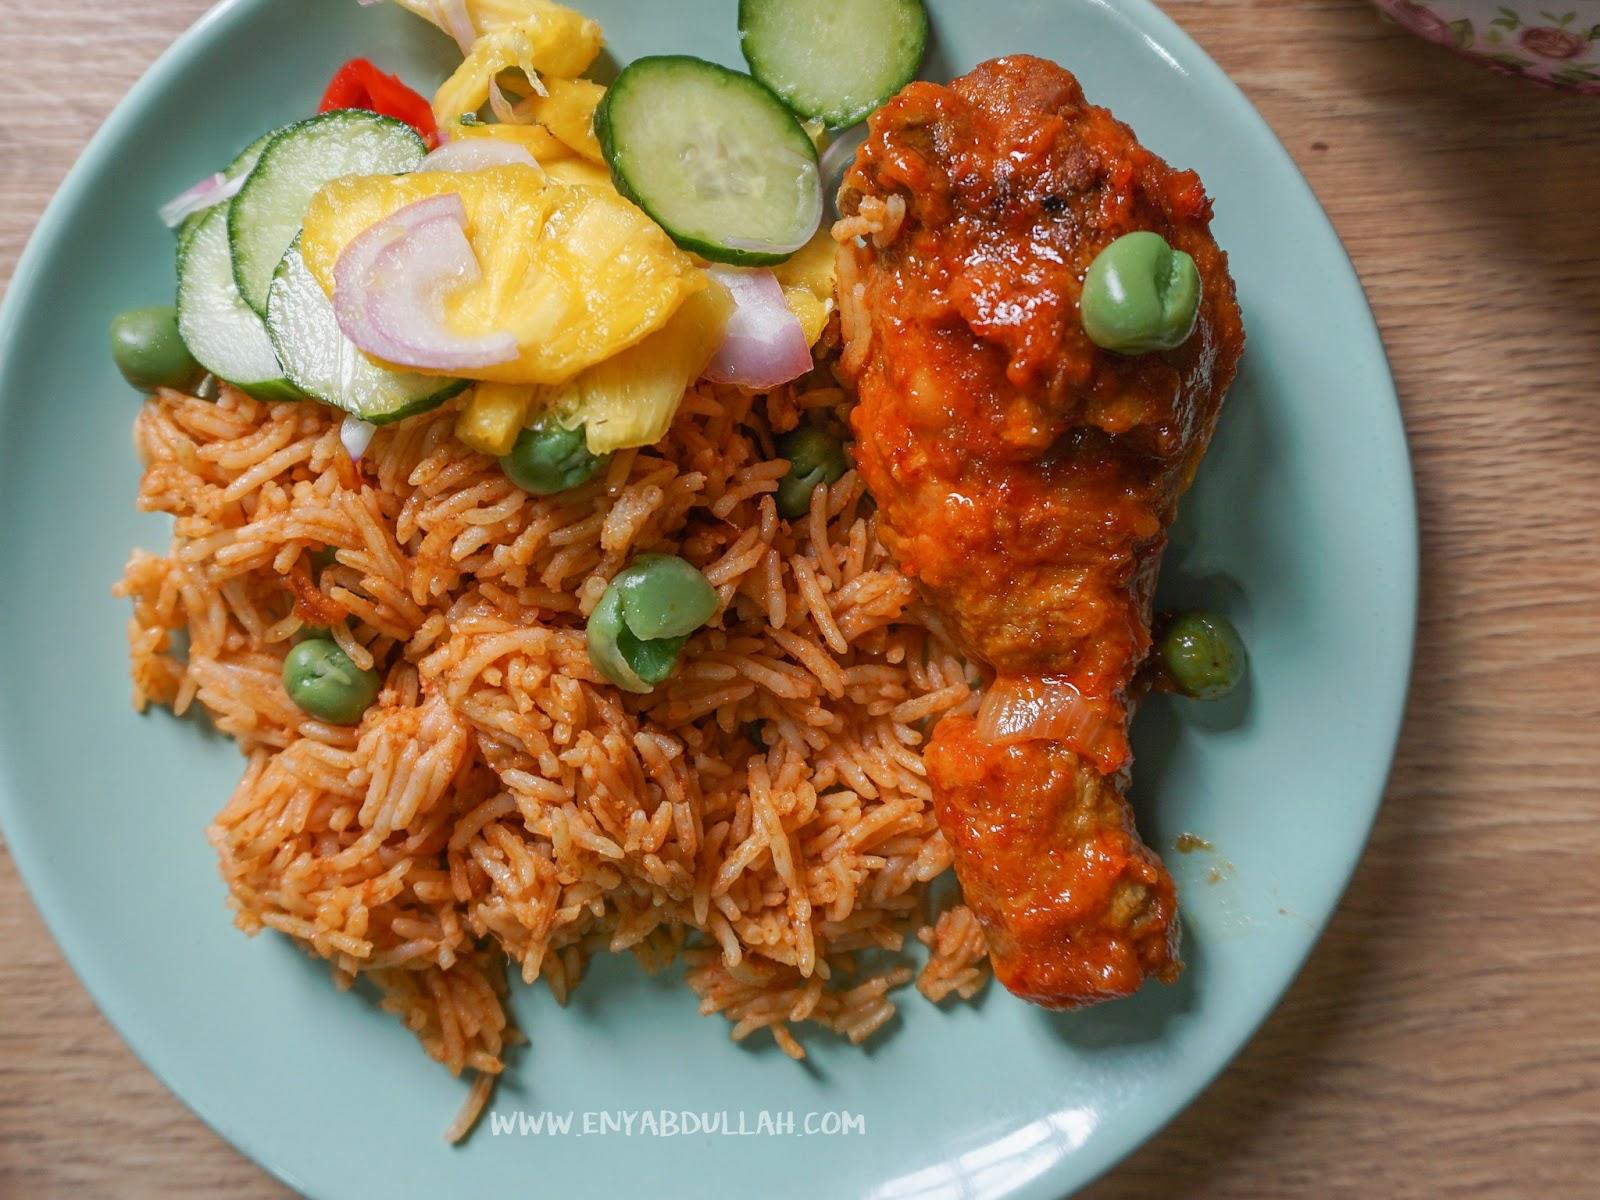 Nasi Tomato Utara Dan Ayam Masak Merah Style Kenduri | EnyAbdullah.Com